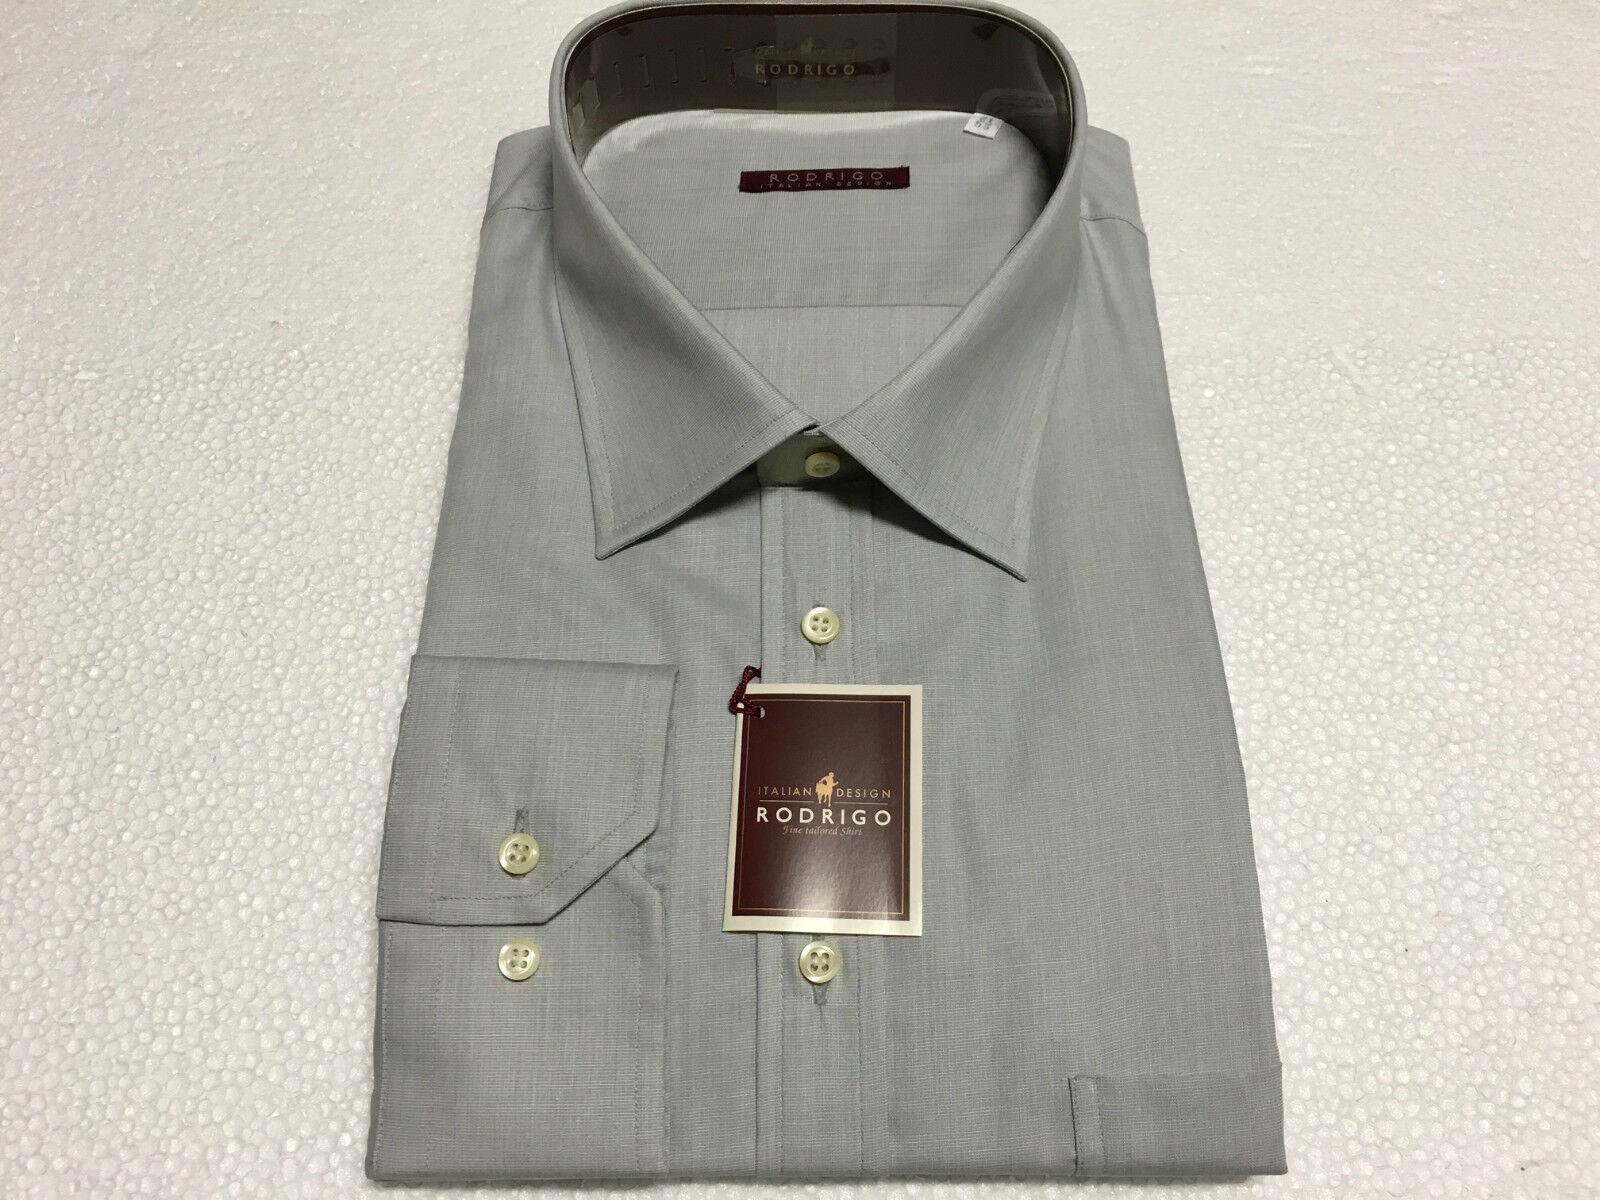 RODRIGO men's shirts linea outsize grey 100% cotton 53-21